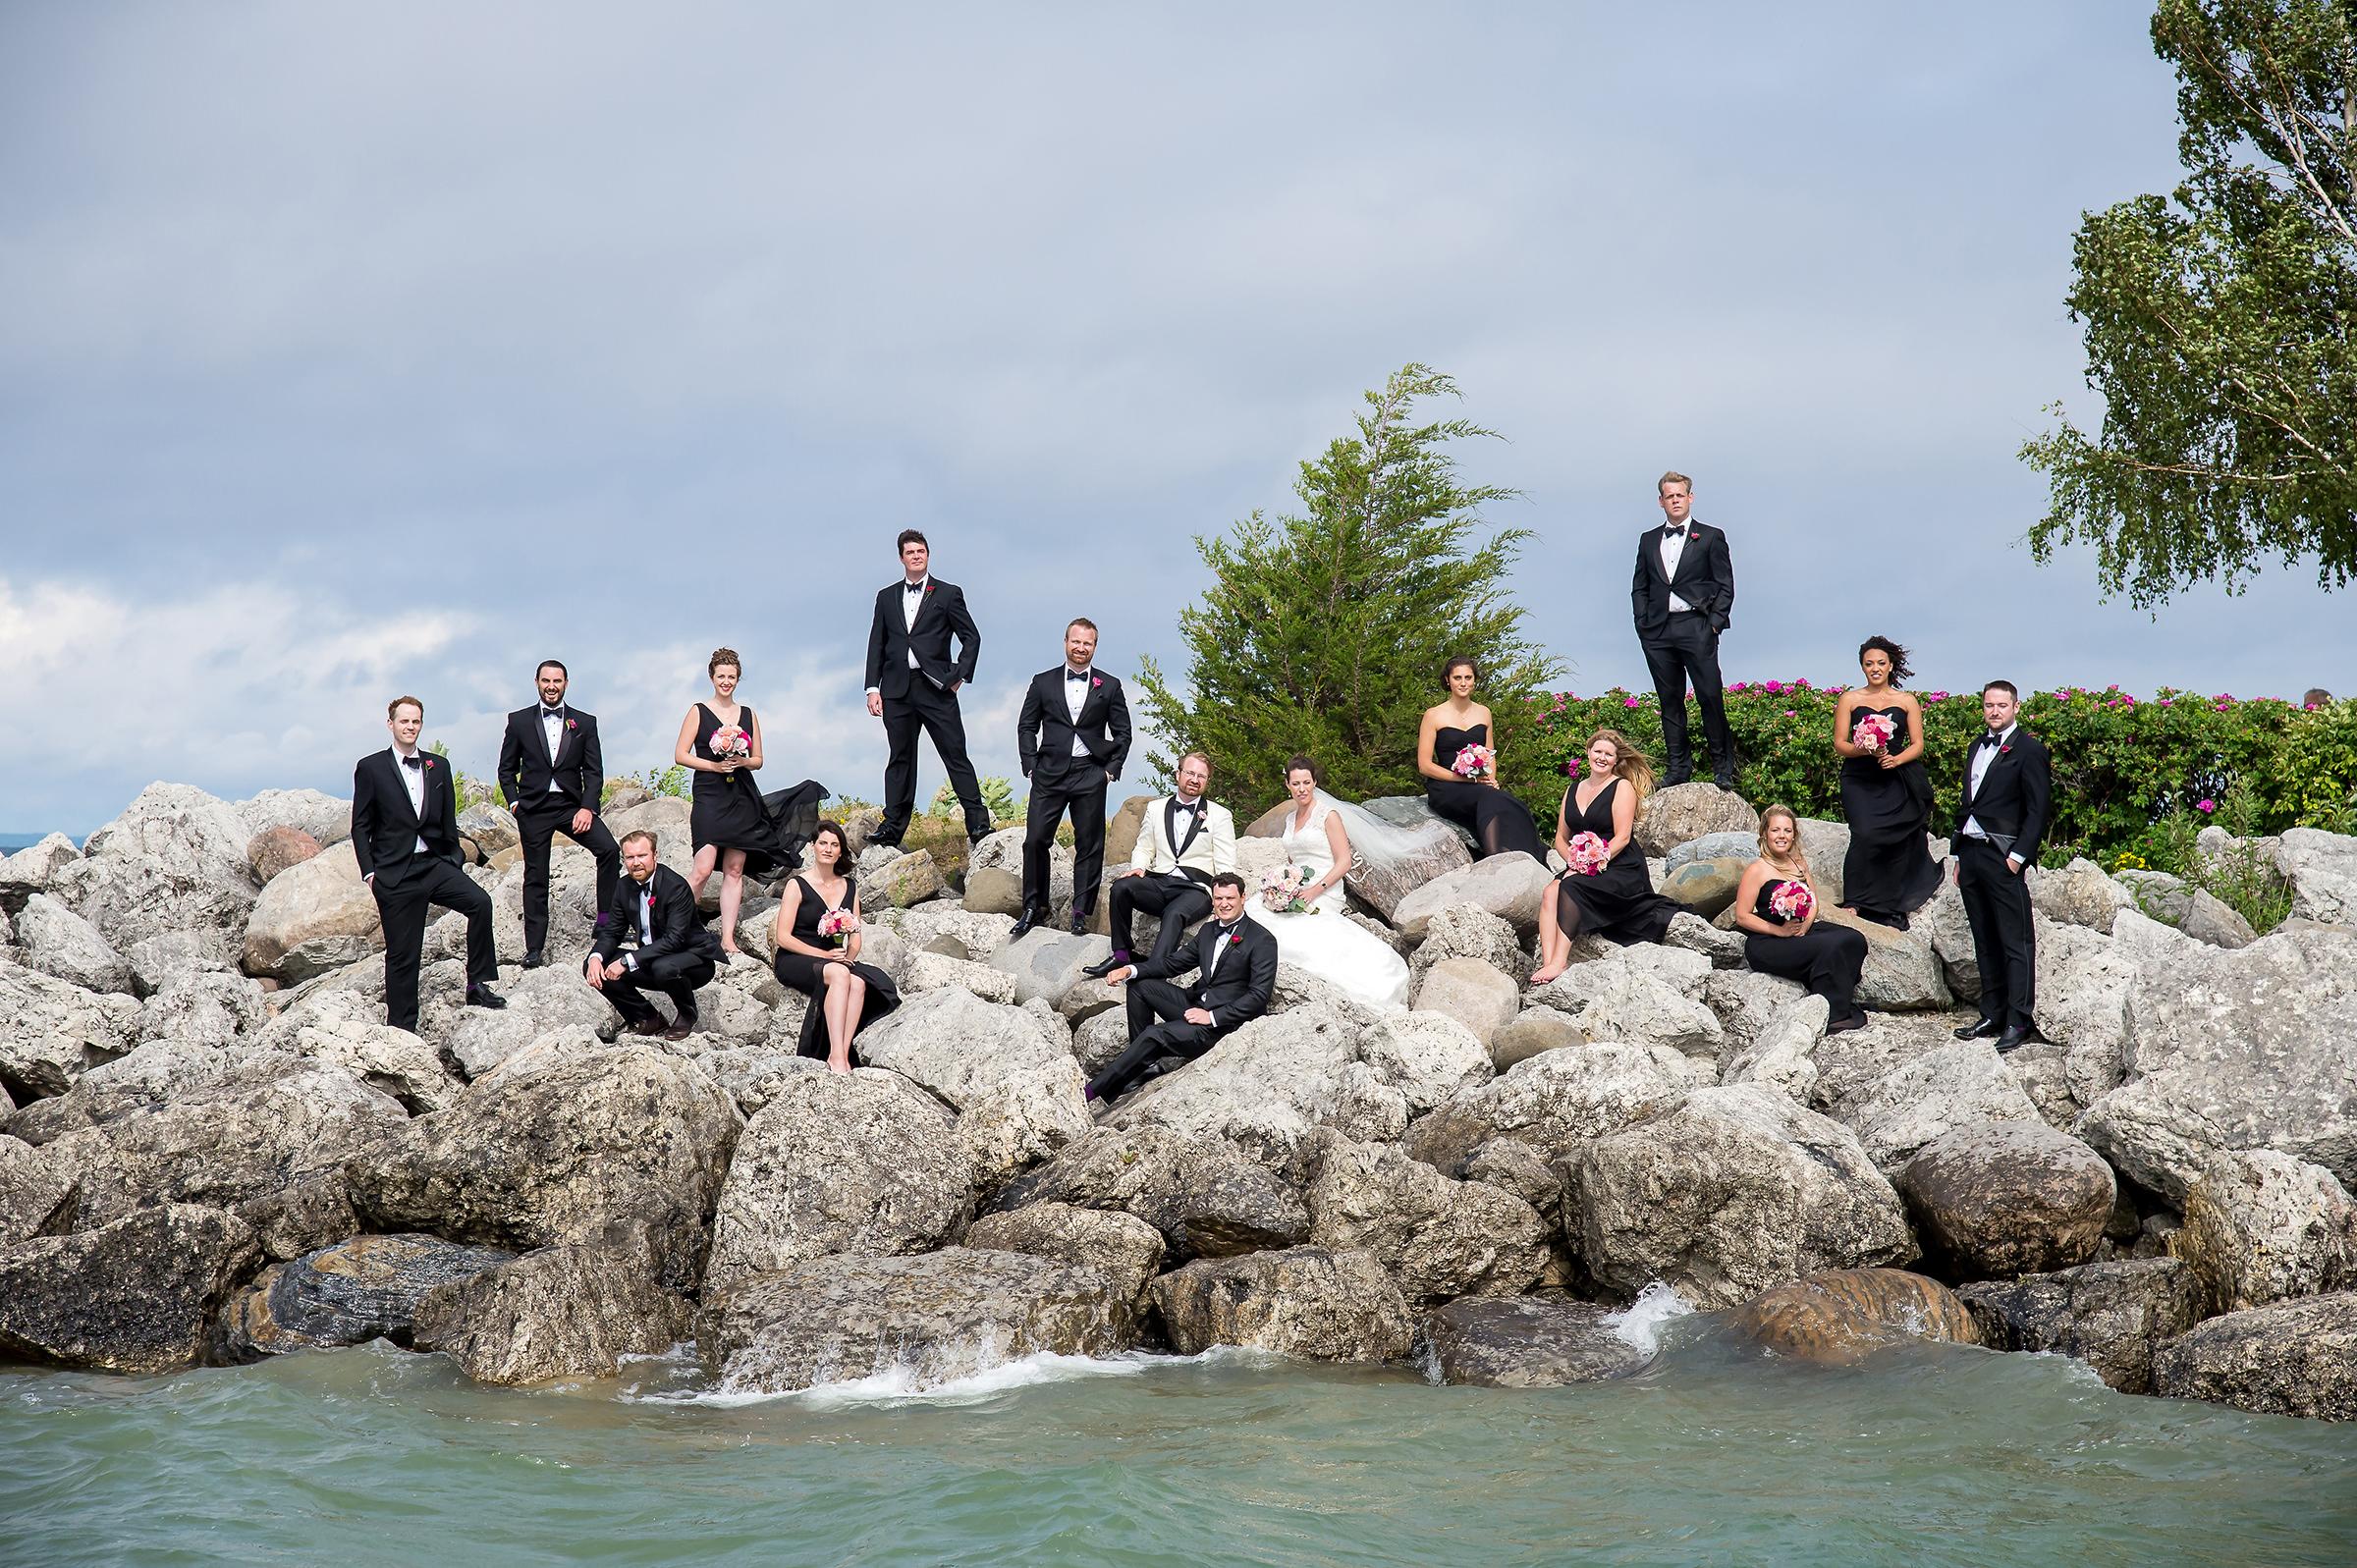 Classic beach wedding group shot photo by David & Sherry Photography